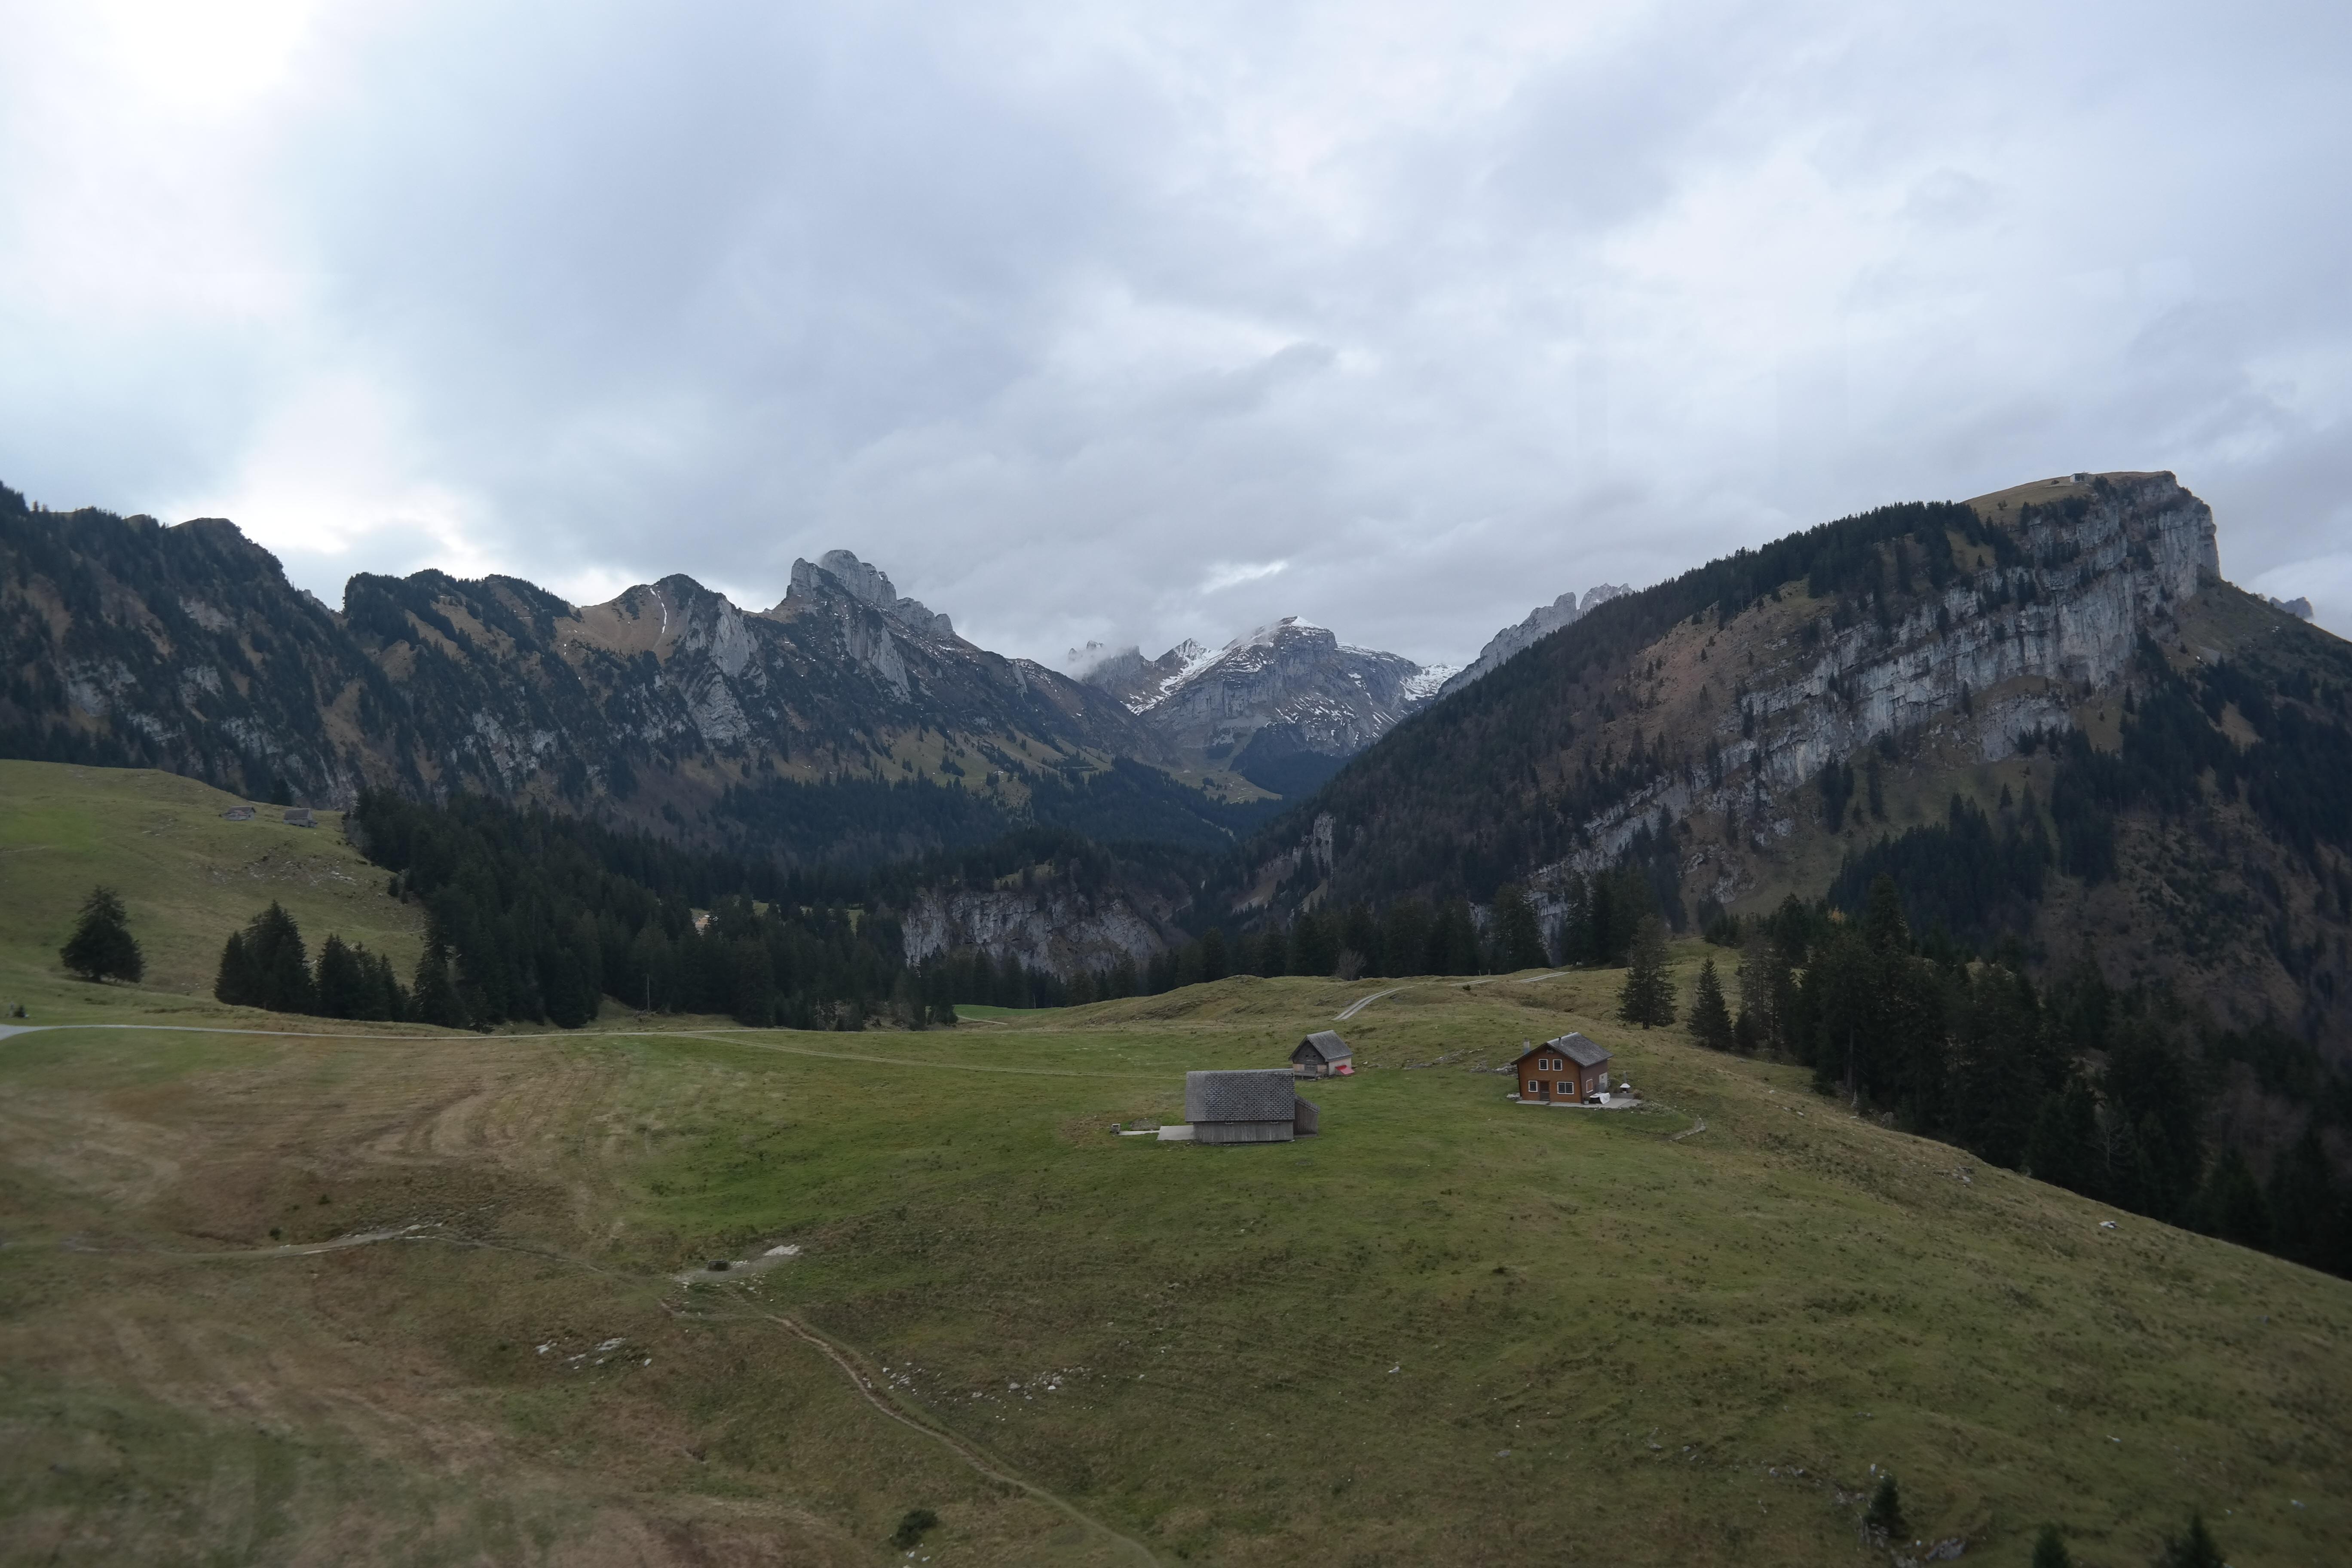 Gambar Pemandangan Padang Rumput Danau Lembah Pegunungan